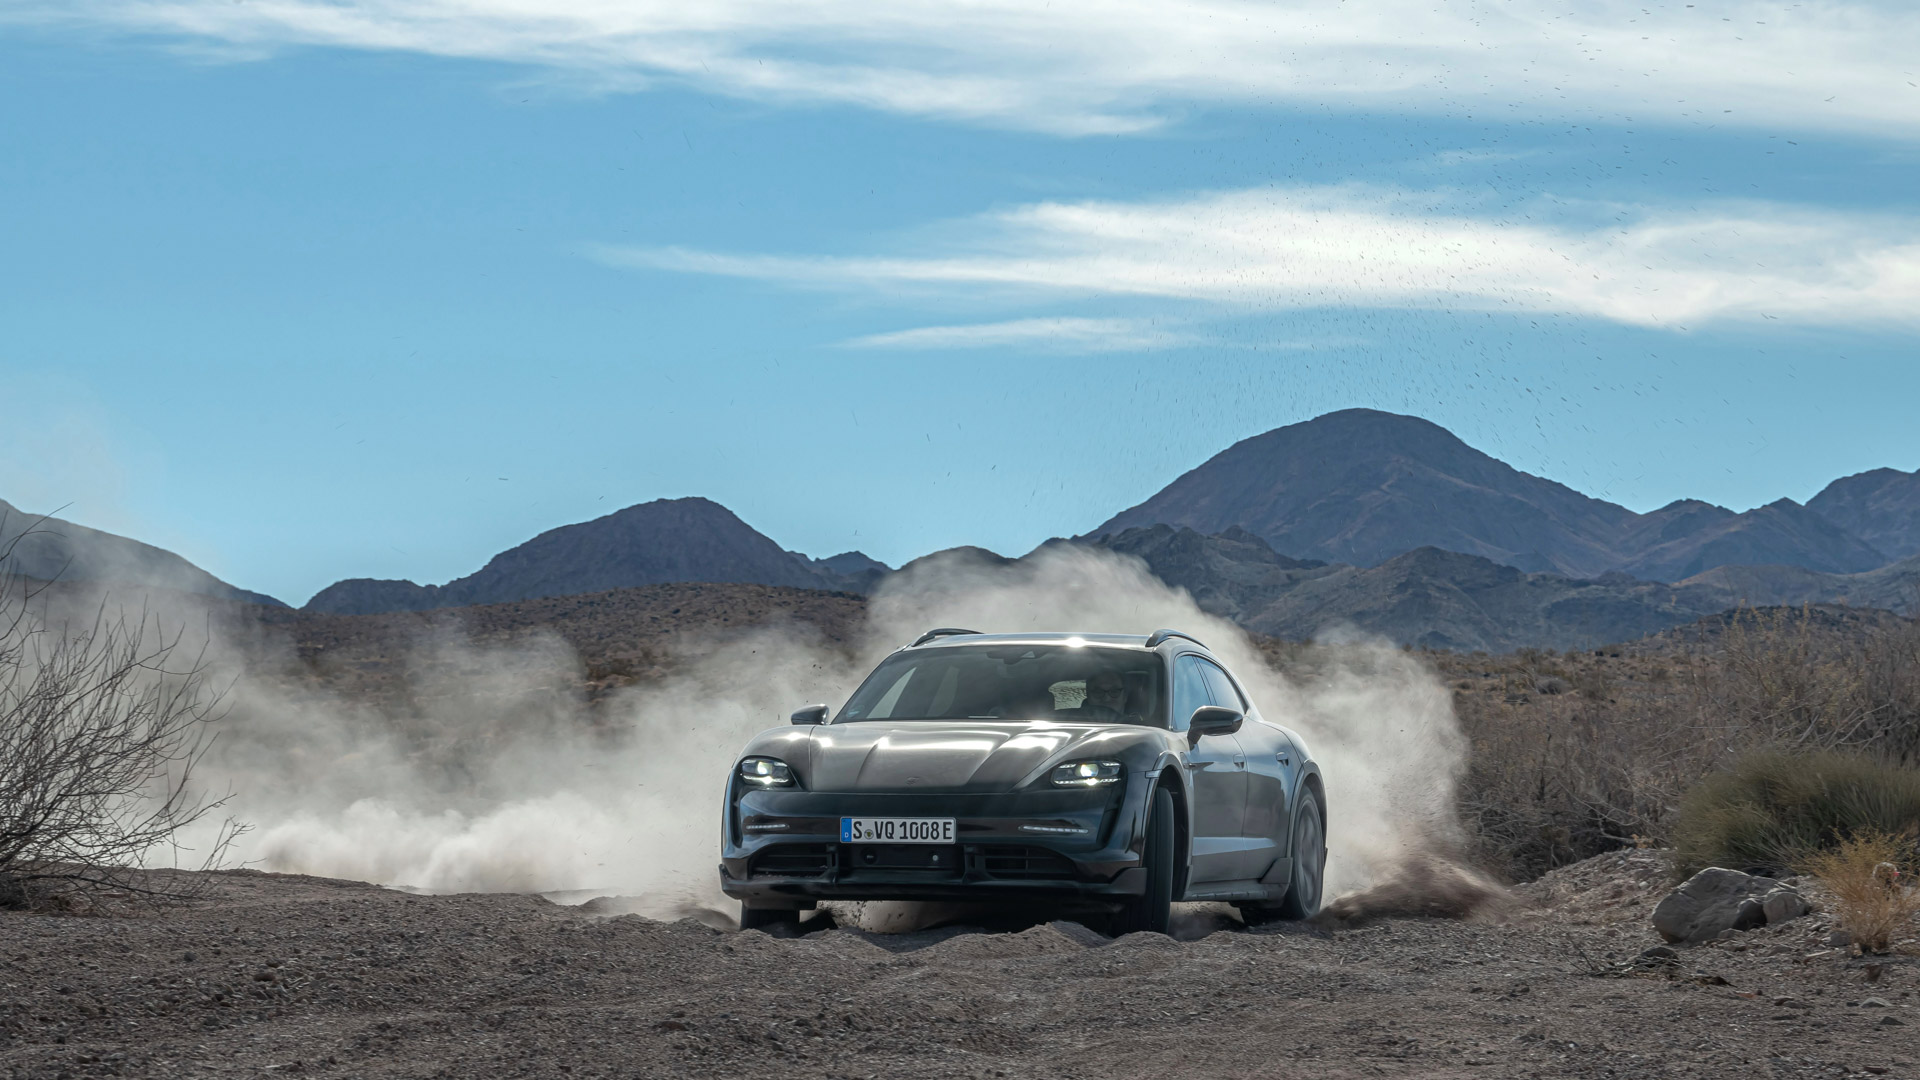 Porsche-Taycan-Cross-Turismo-6.jpg